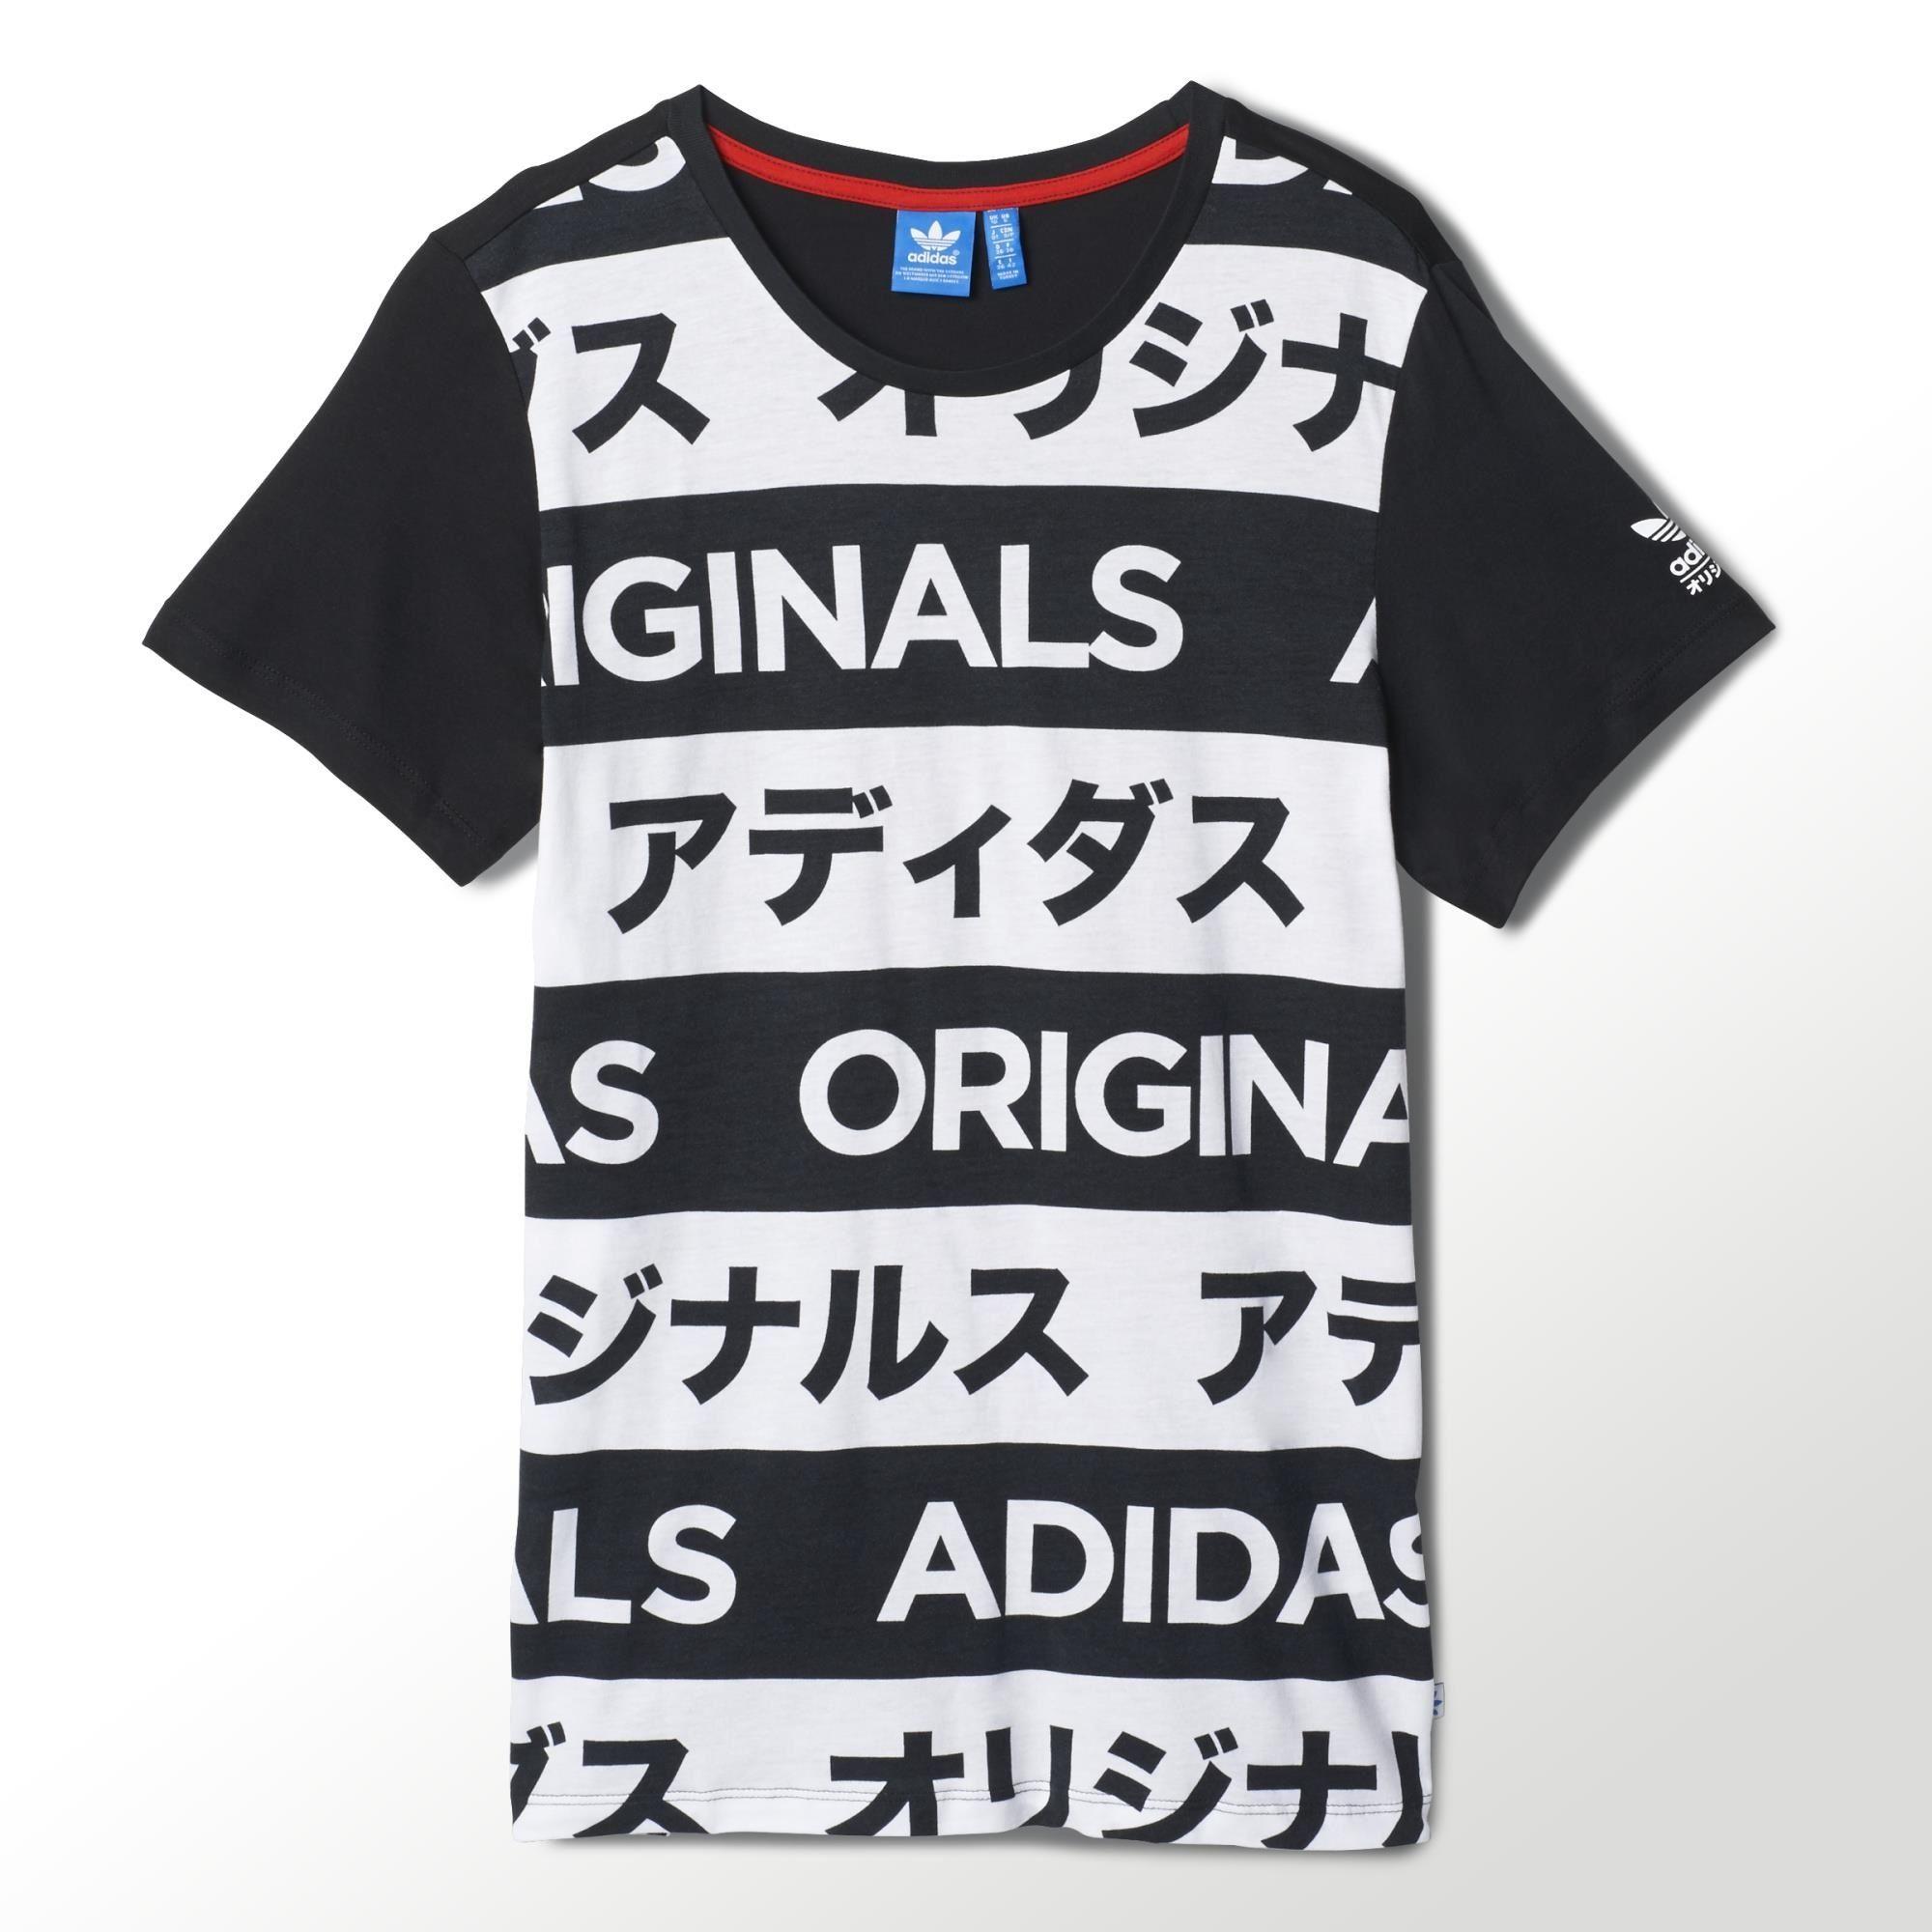 Adidas Allover Print Typo Tee Adidas Us Typo Tees Short Sleeve Shirt Women Printed Shirts [ 2000 x 2000 Pixel ]